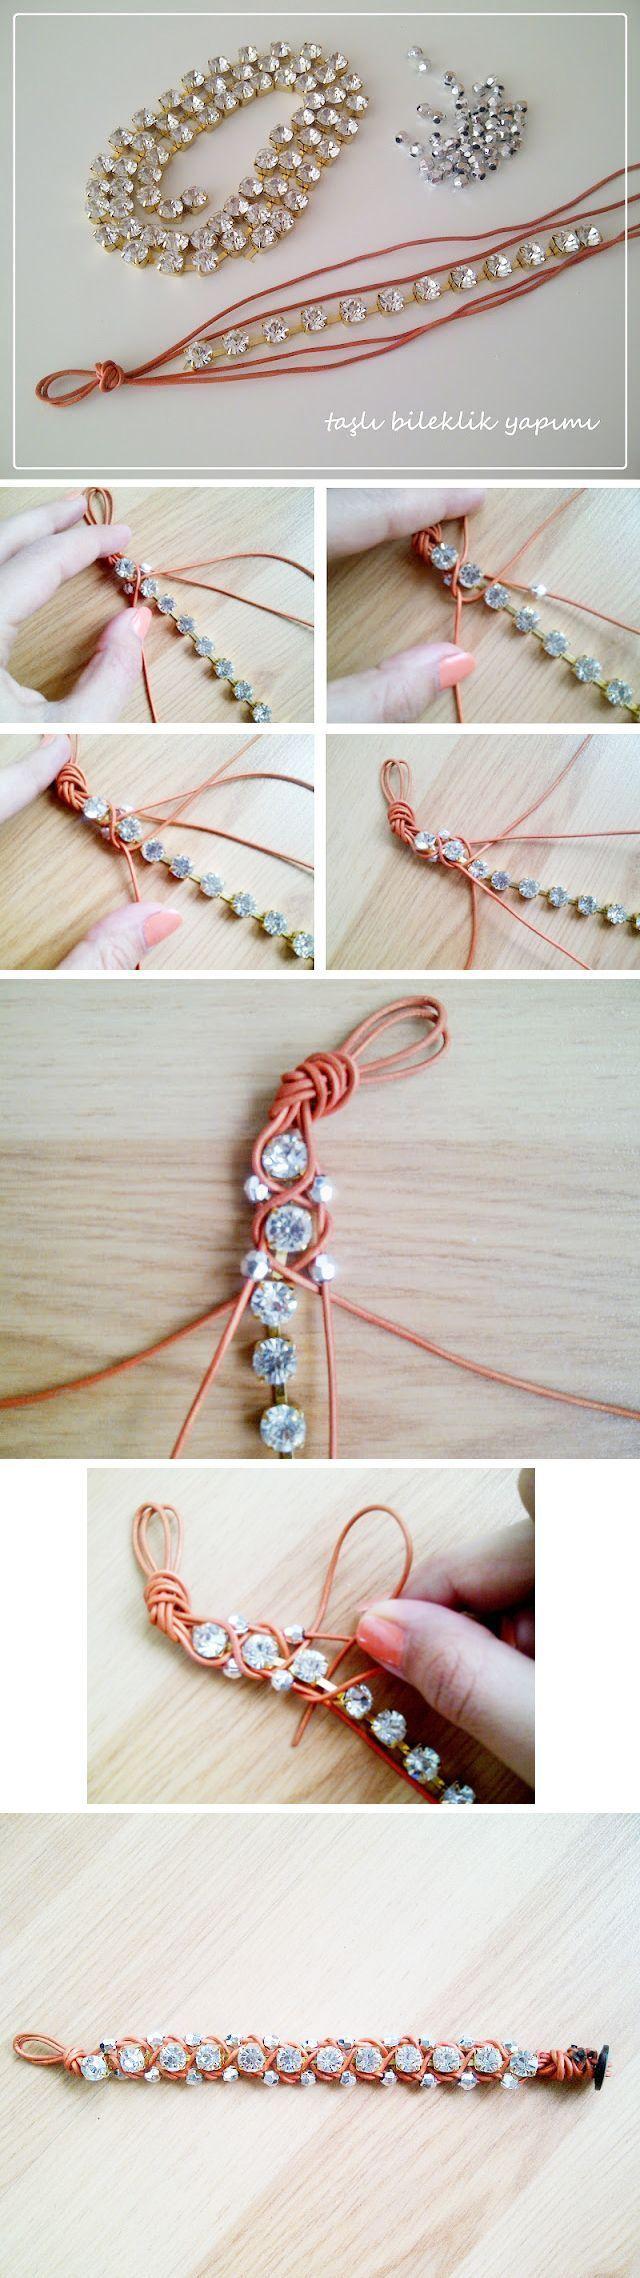 Diy rhinestone bracelet fine jewelry pinterest bracelets solutioingenieria Choice Image